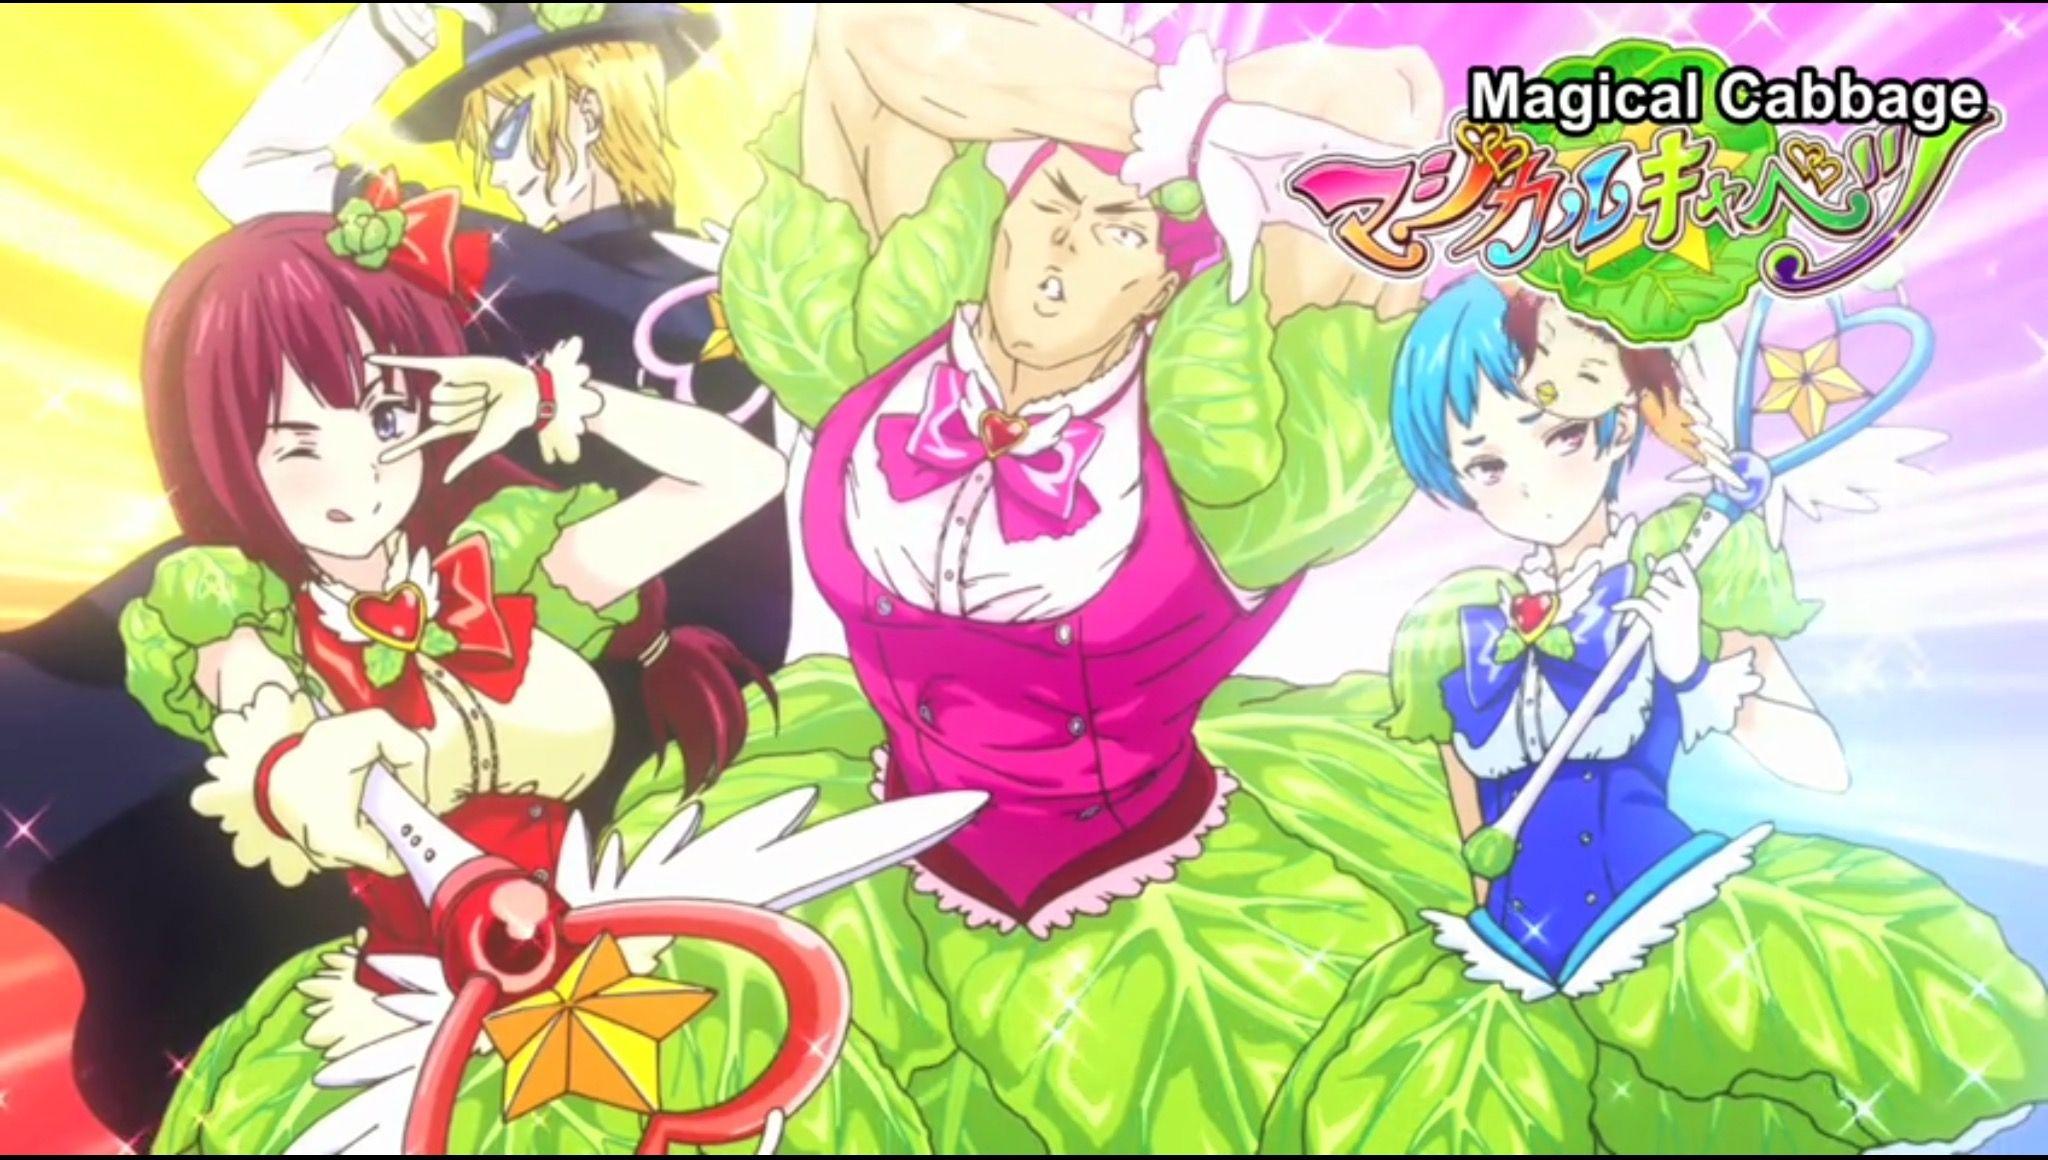 WTF... Magical Cabbage, eh? Shokugeki no Soma, Episode 11.